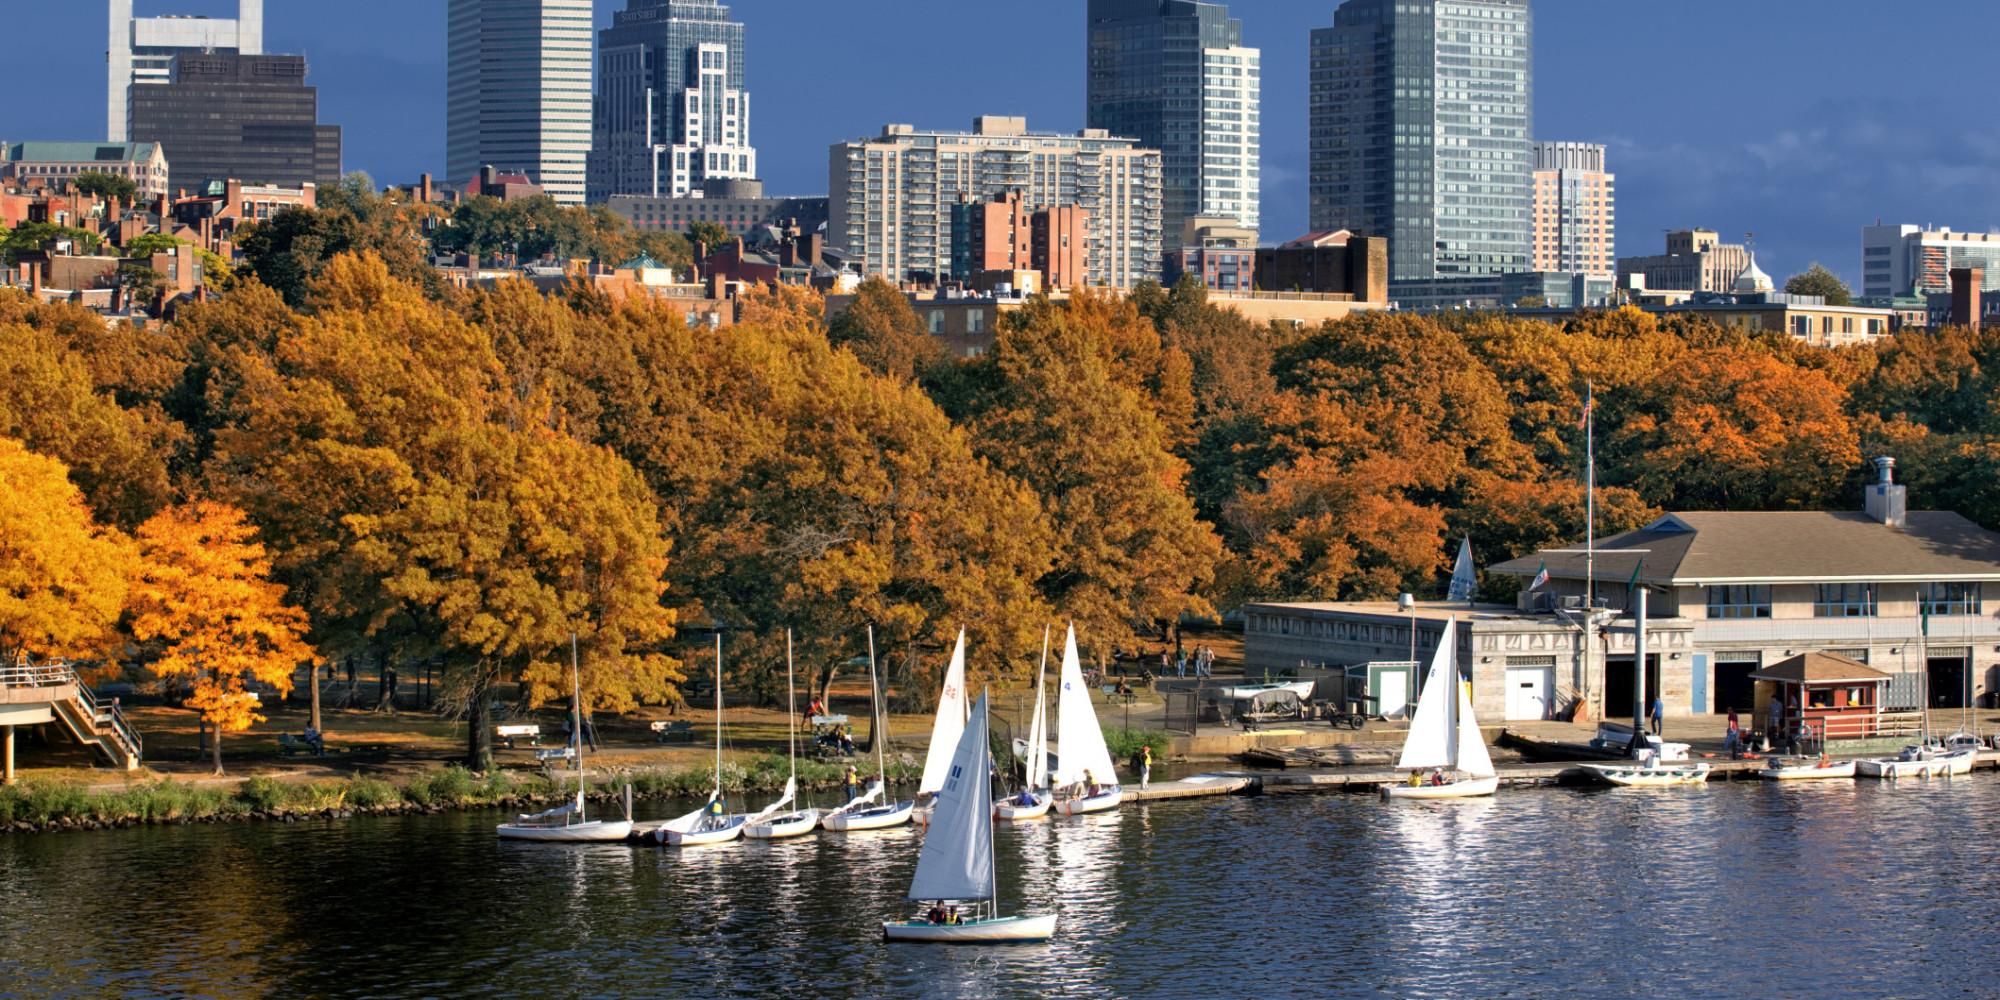 Rustic Fall Desktop Wallpaper Explore New England The Best Activities For Fall 2014